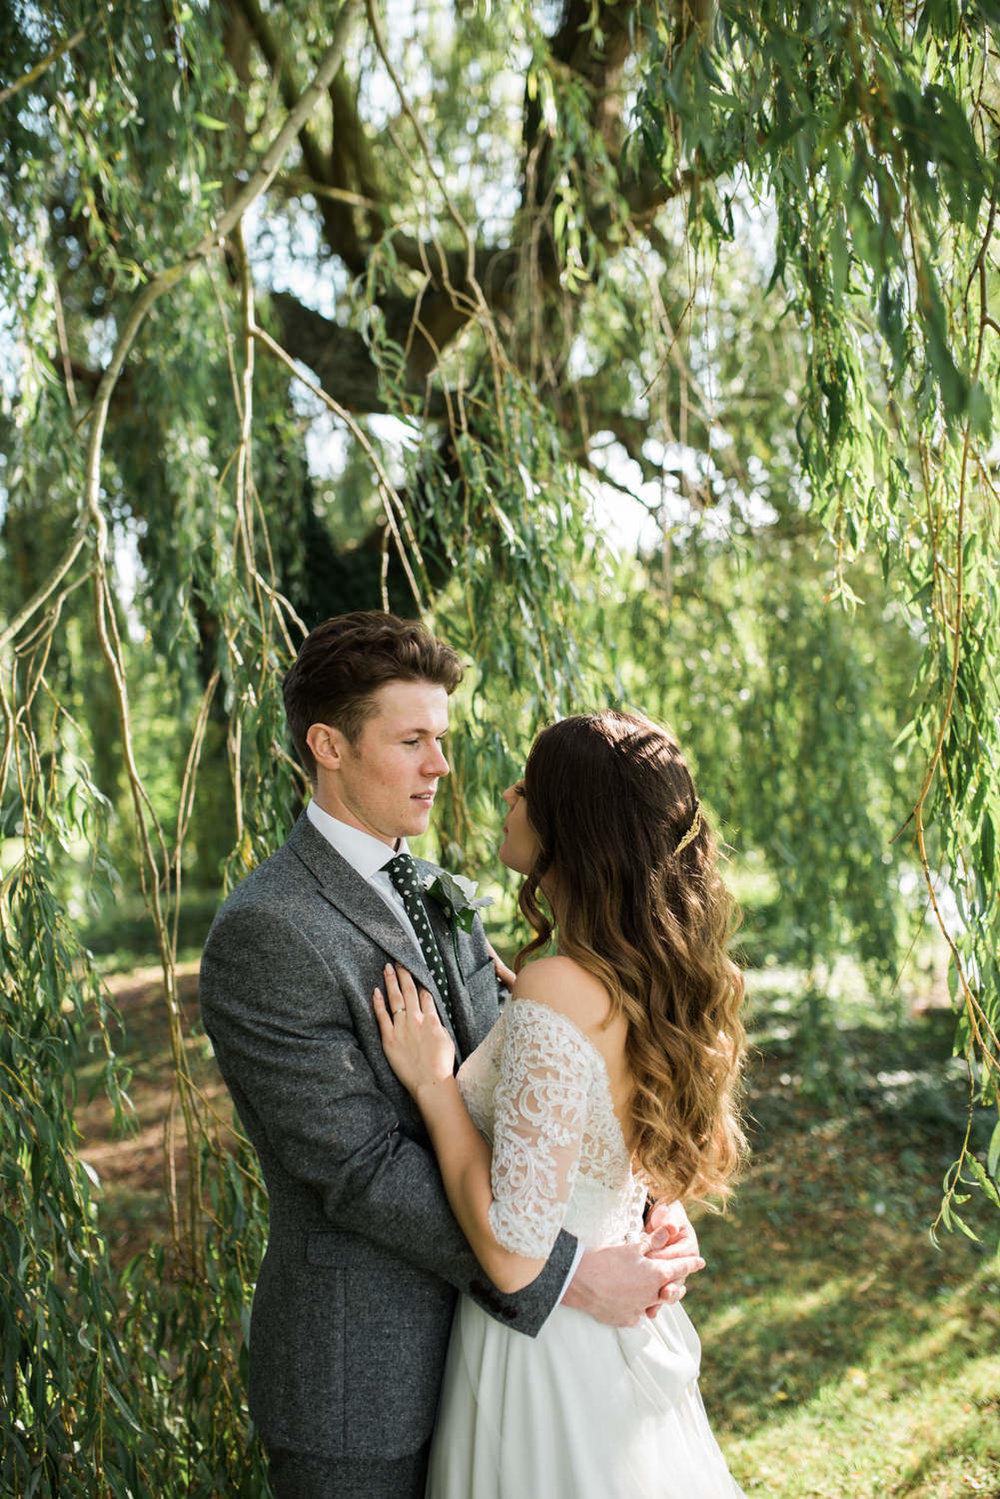 the-reid-rooms-wedding-photographers-essex-41.jpg